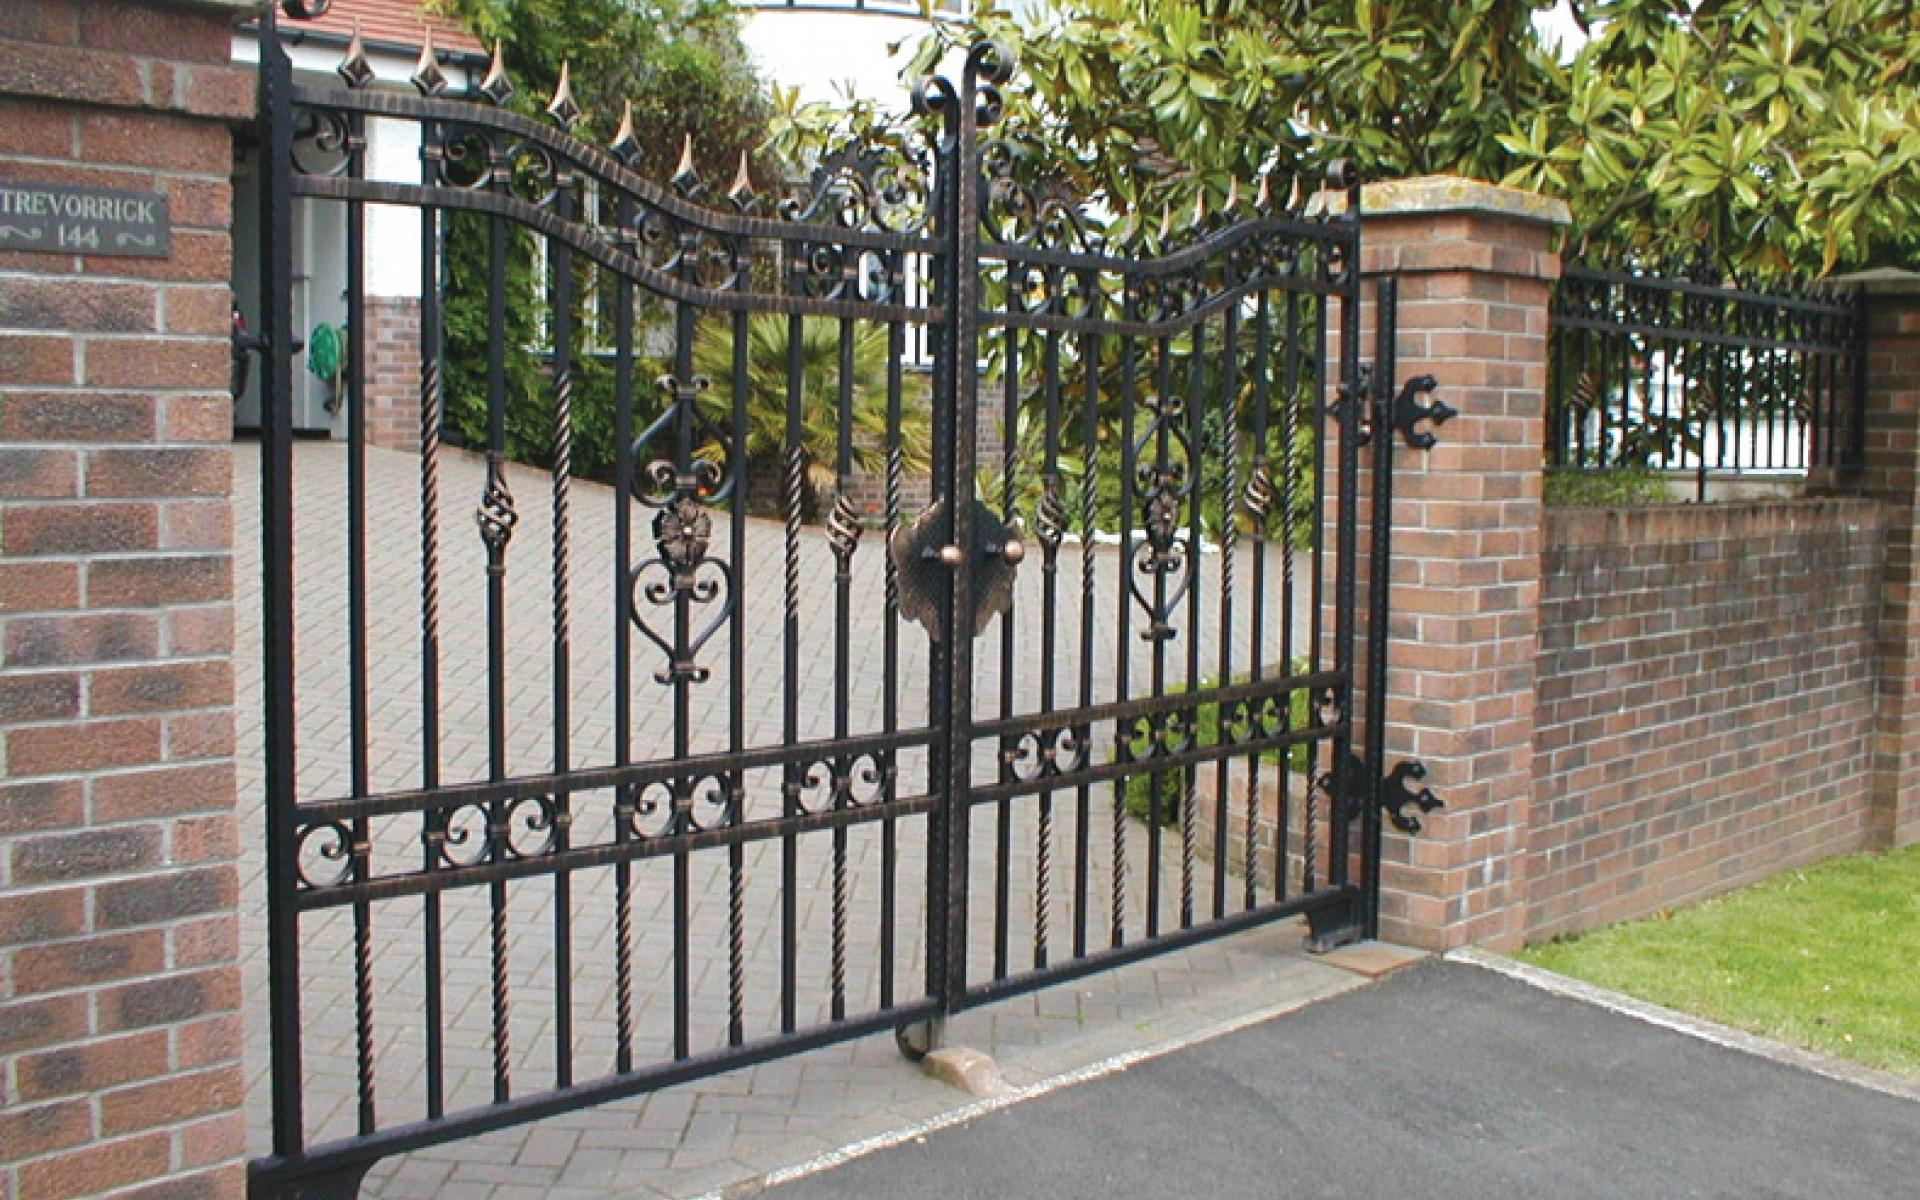 Trevorrick wrought iron gate with underground automation